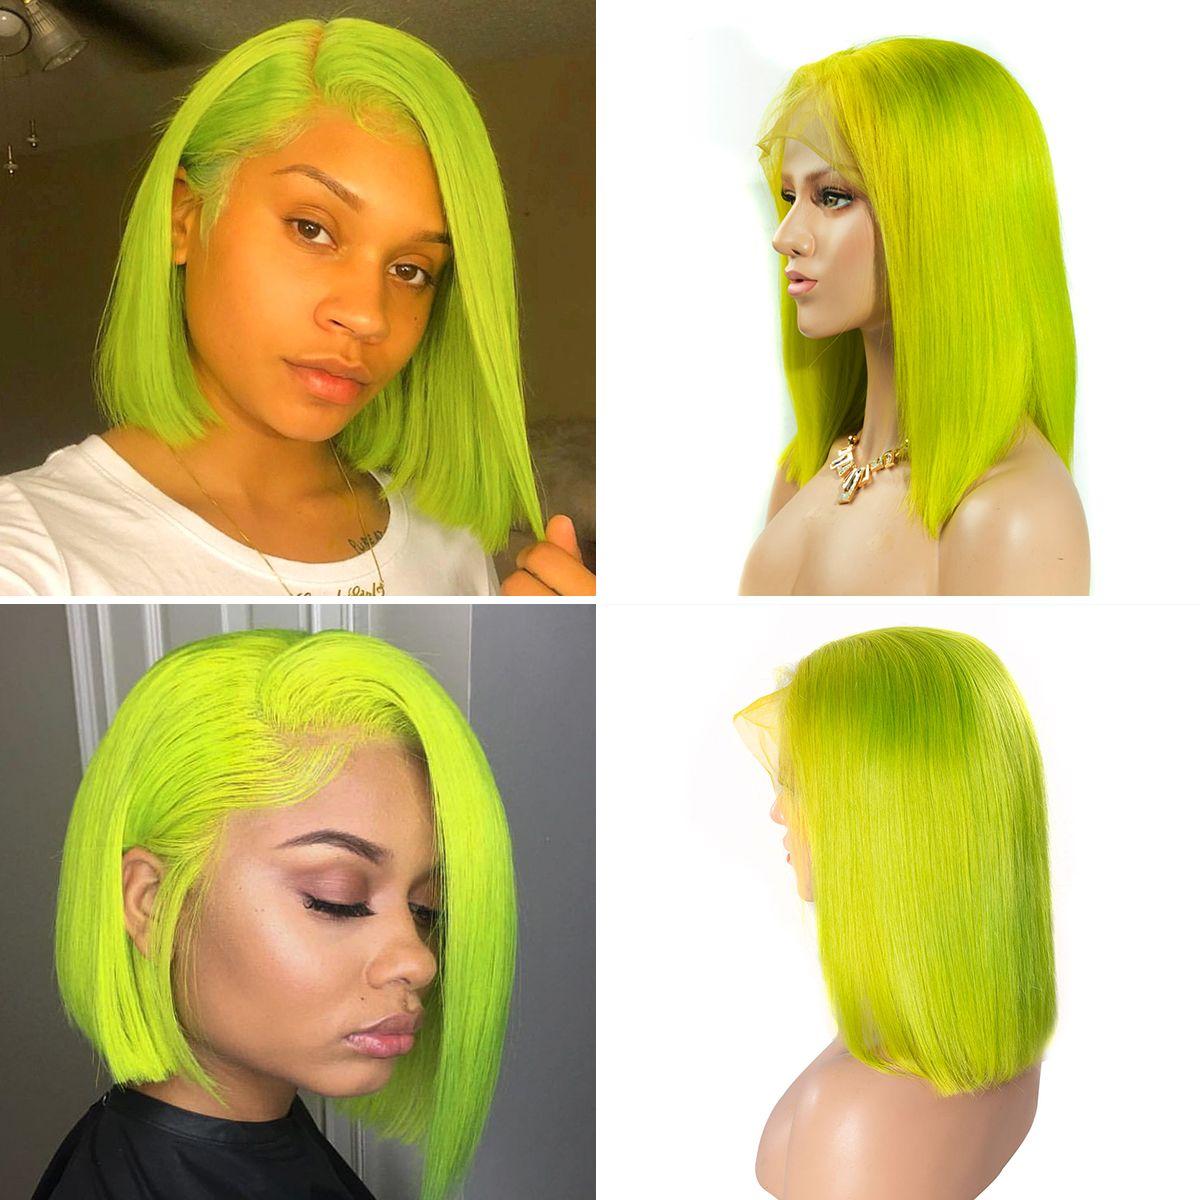 Colorful 13x6 Short Bob Straight Hair - Apple Green